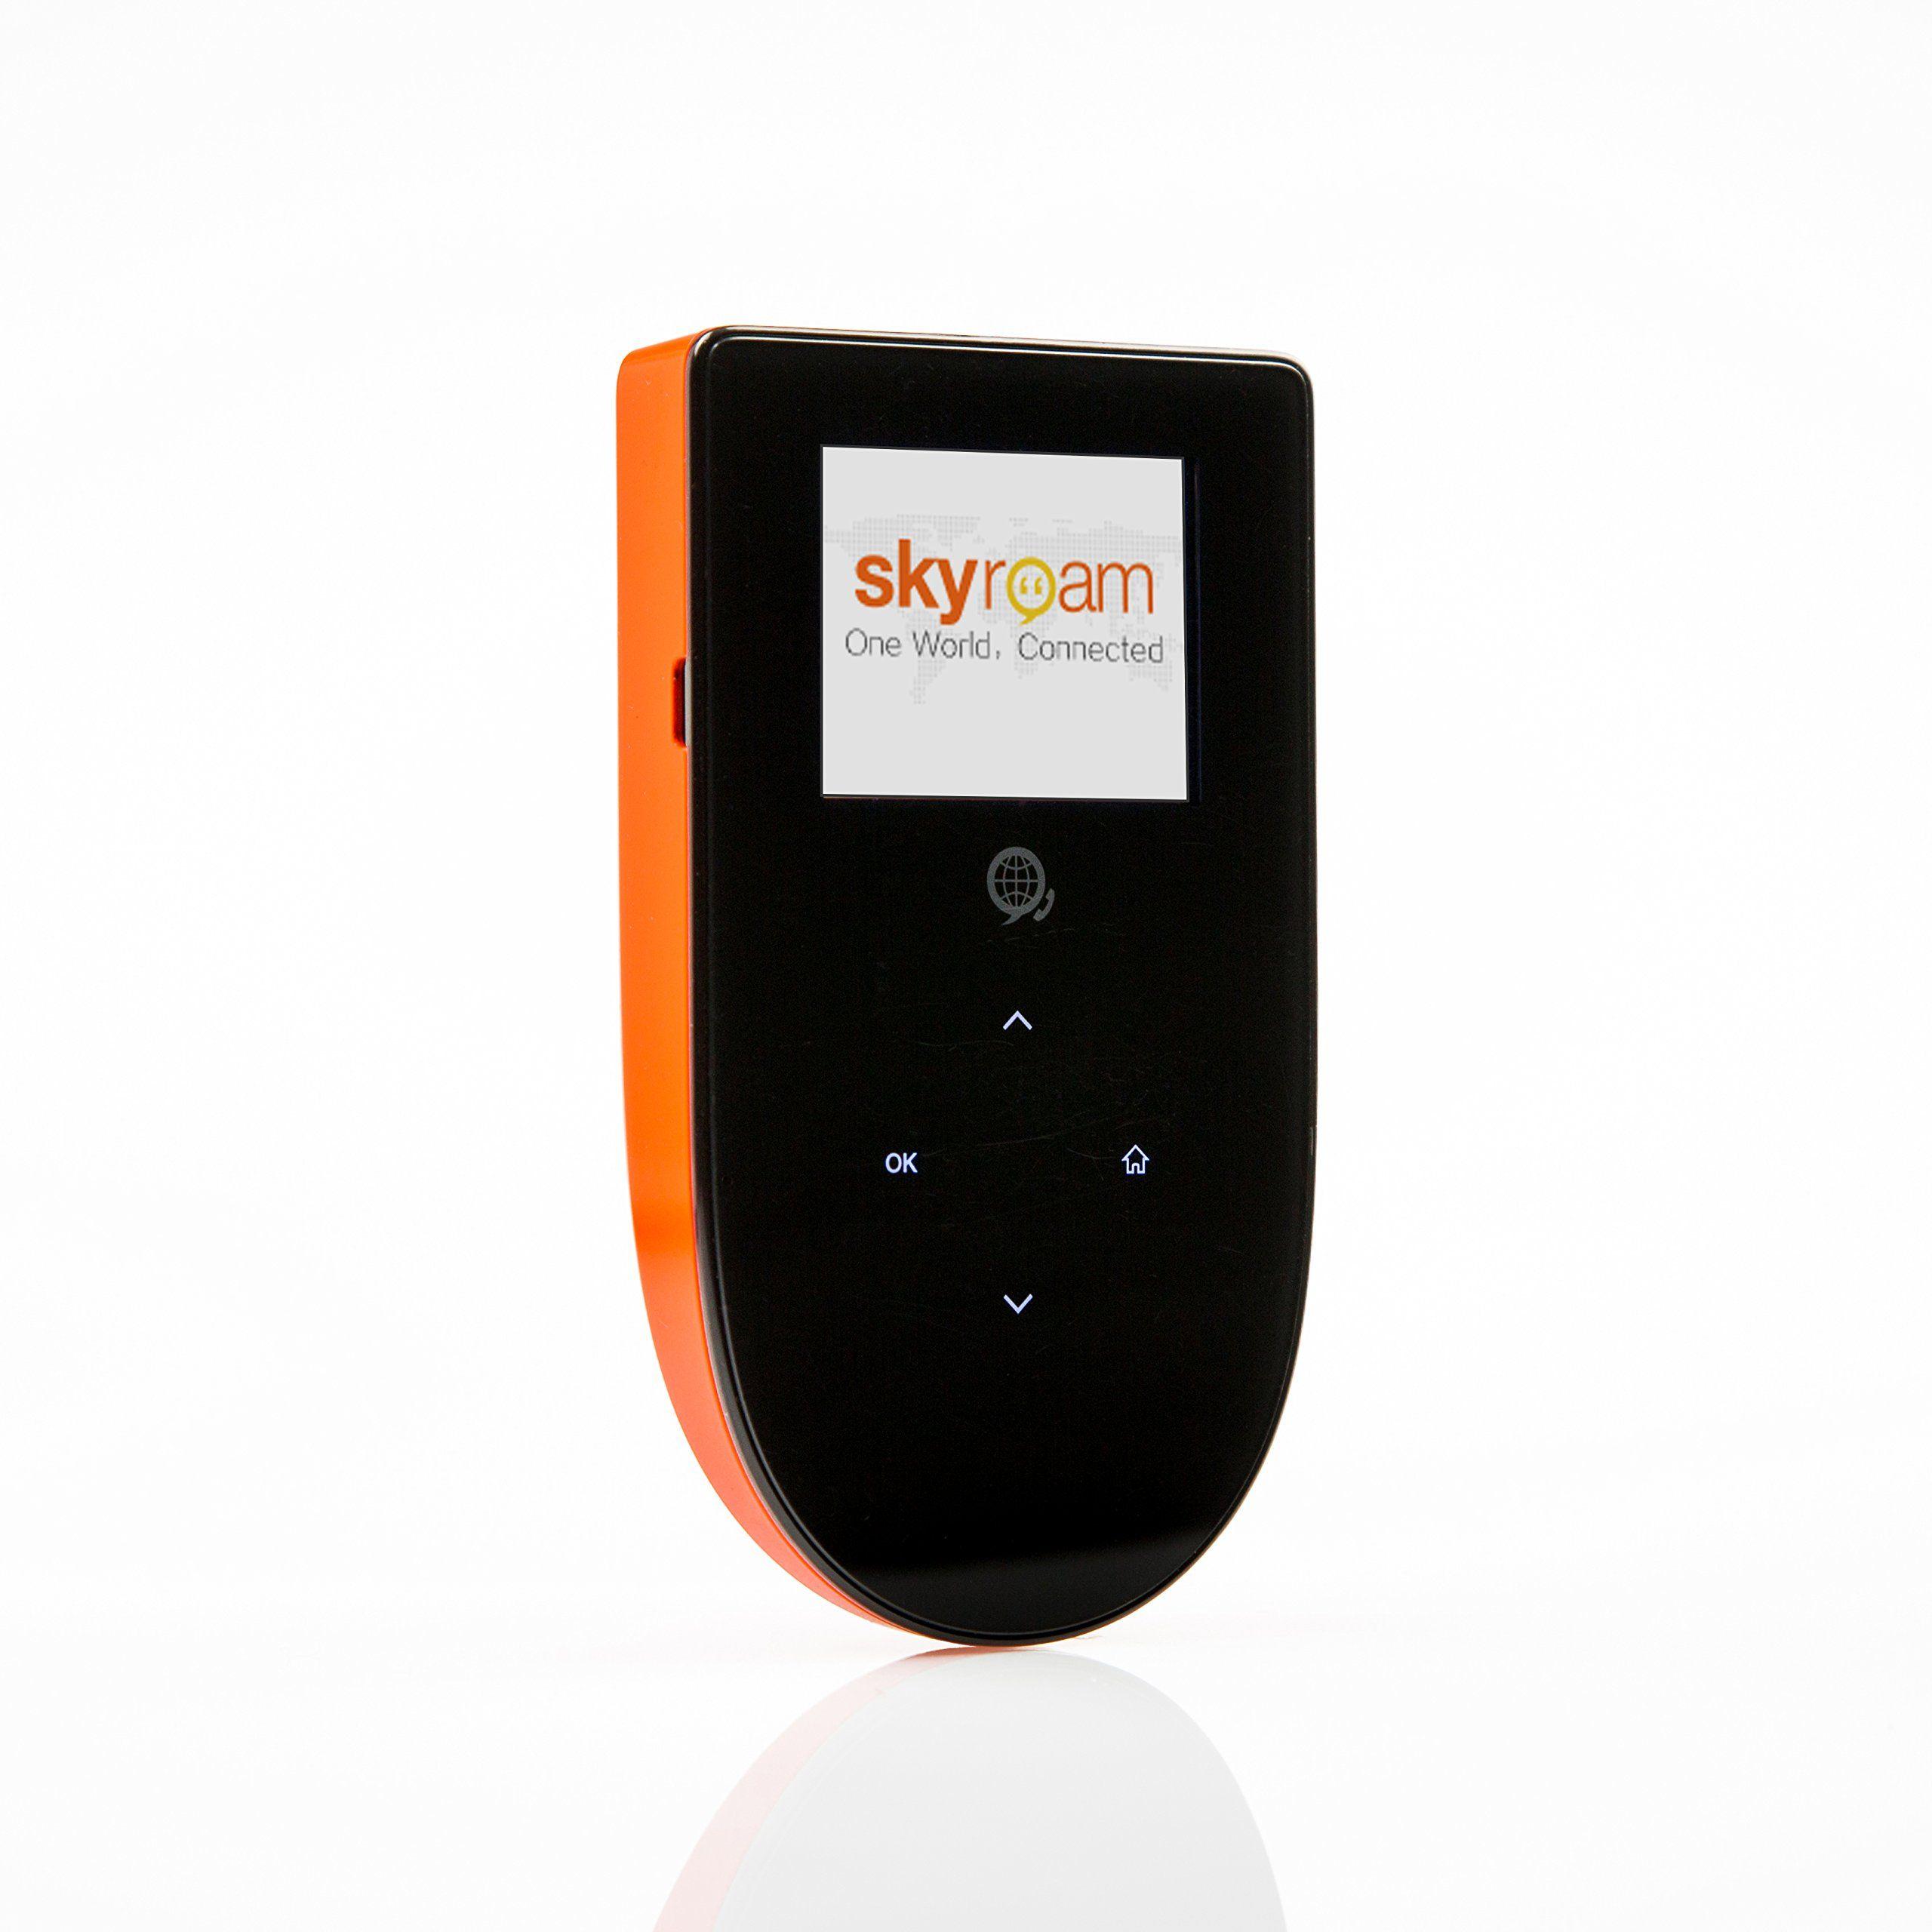 Skyroam Hotspot Payasyougo Wifi for Global